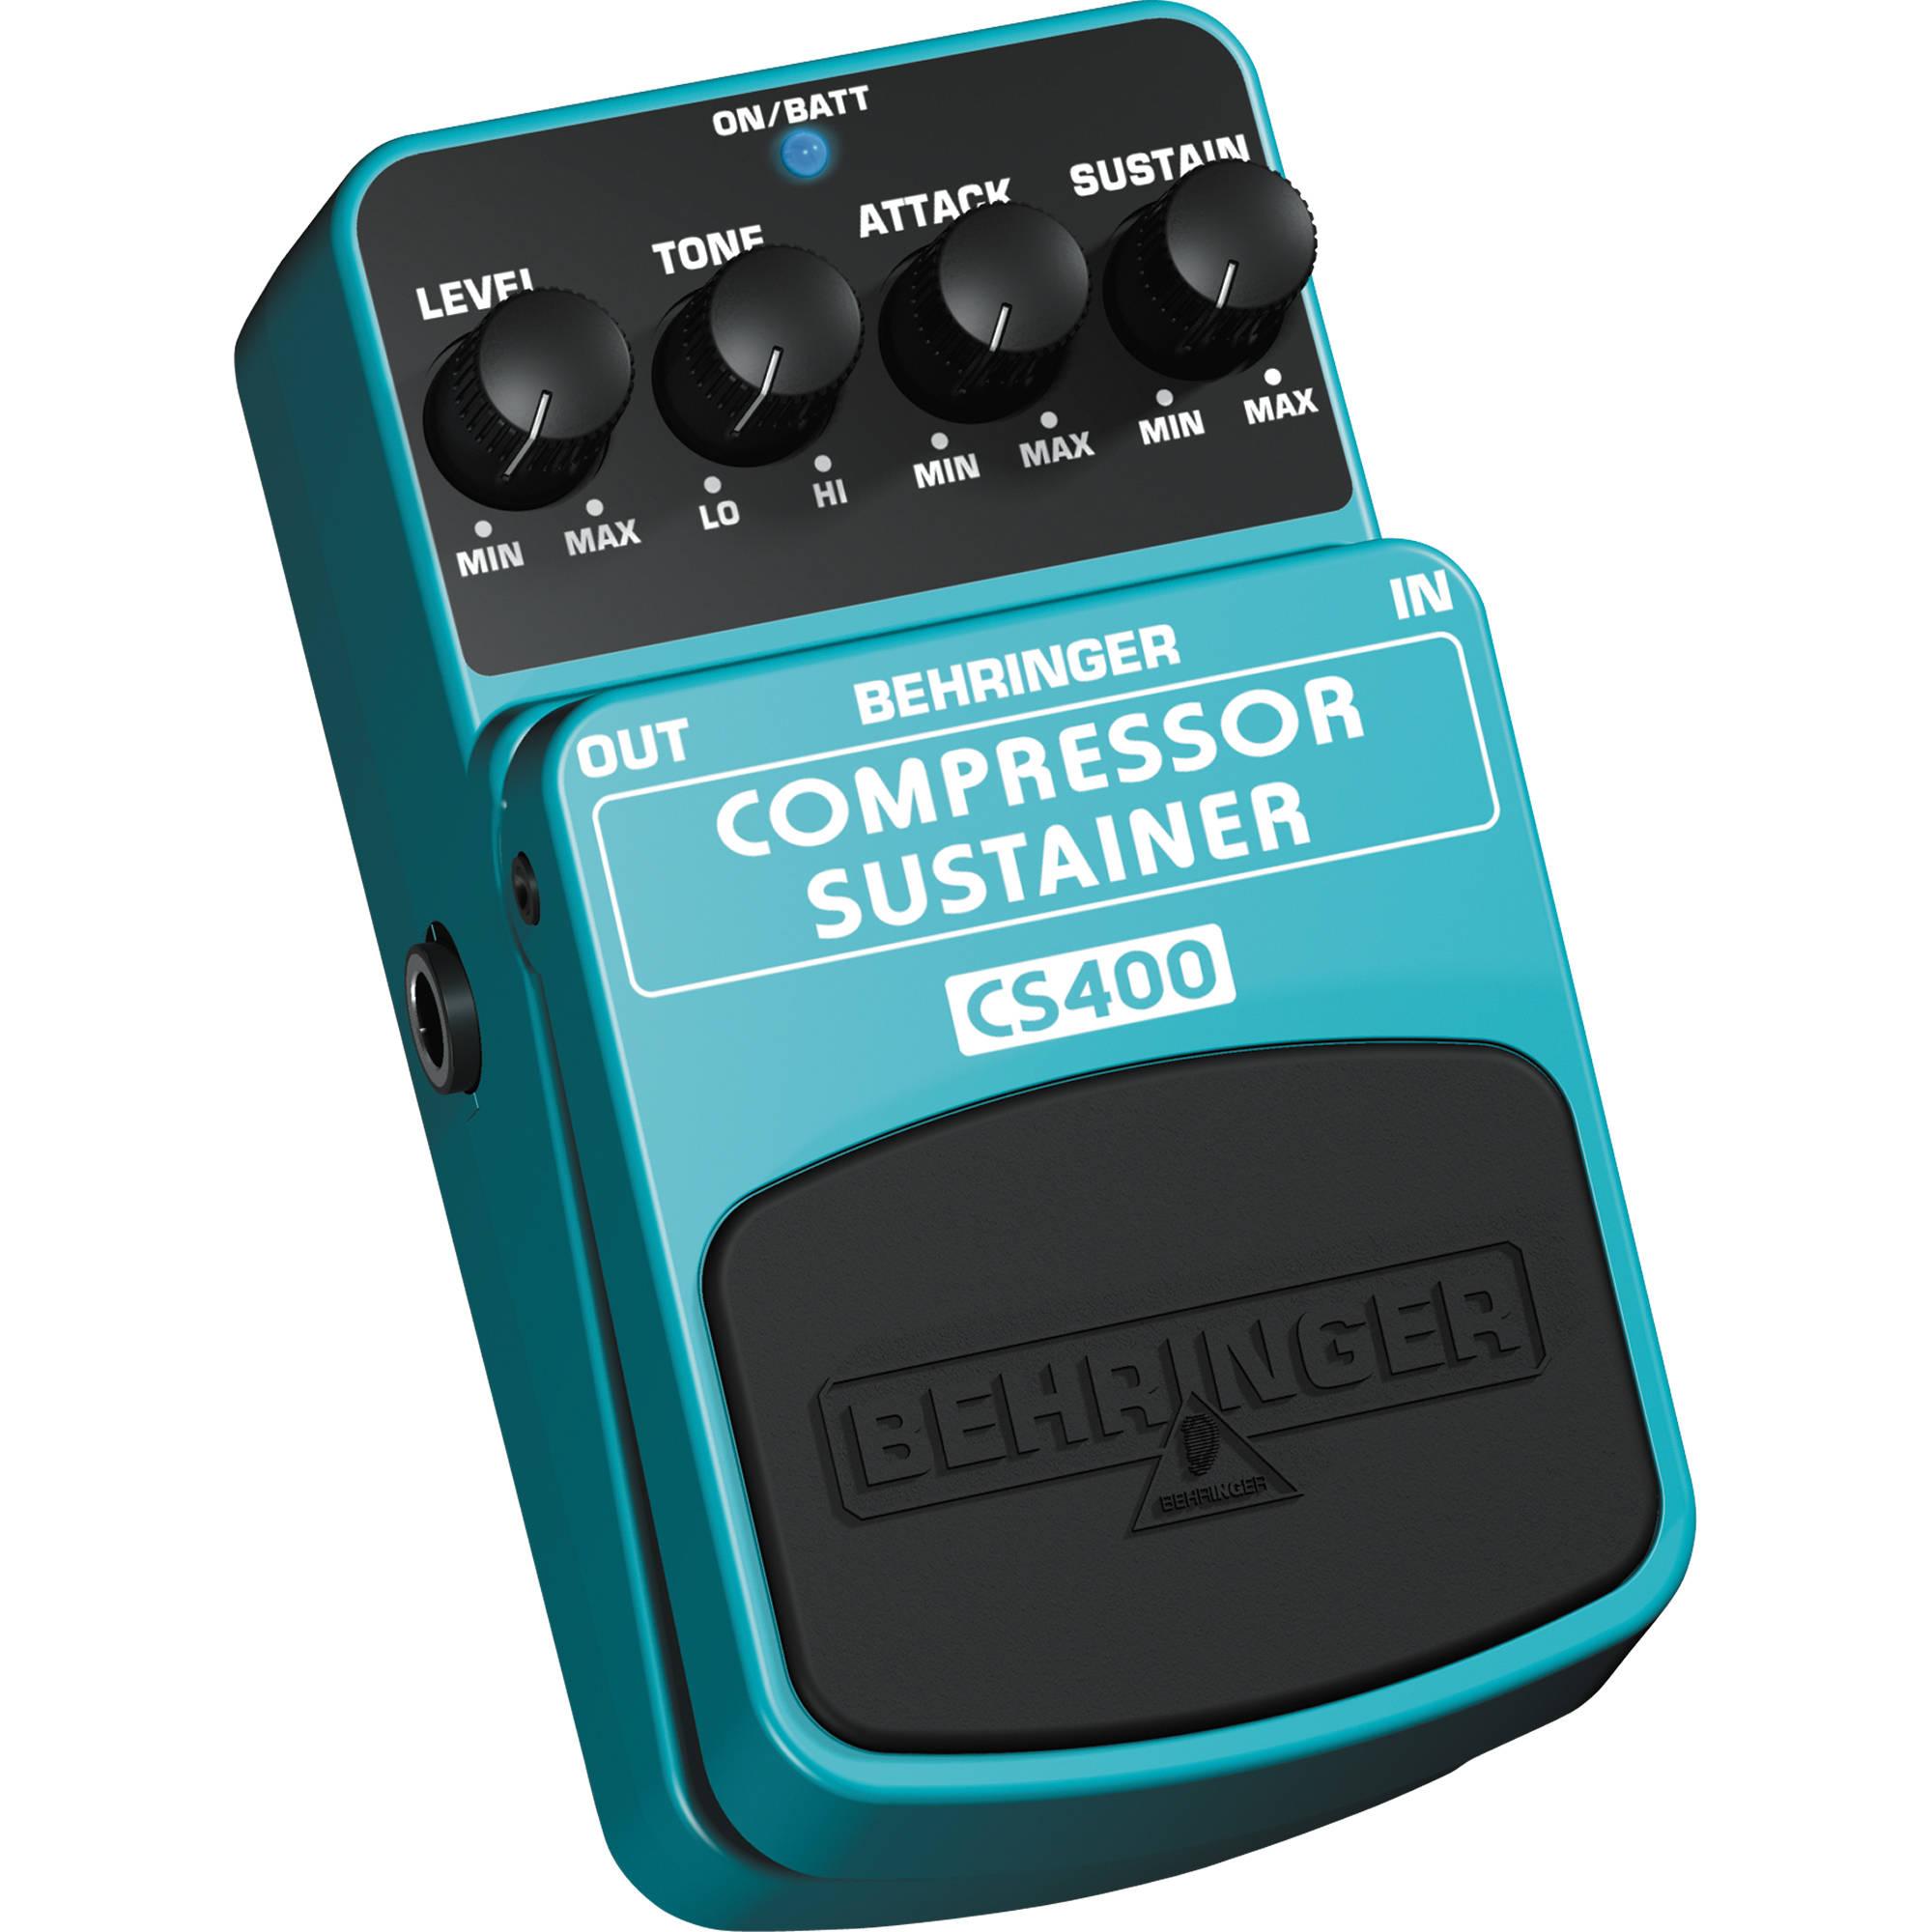 behringer cs400 compressor sustain guitar pedal cs400 b h photo